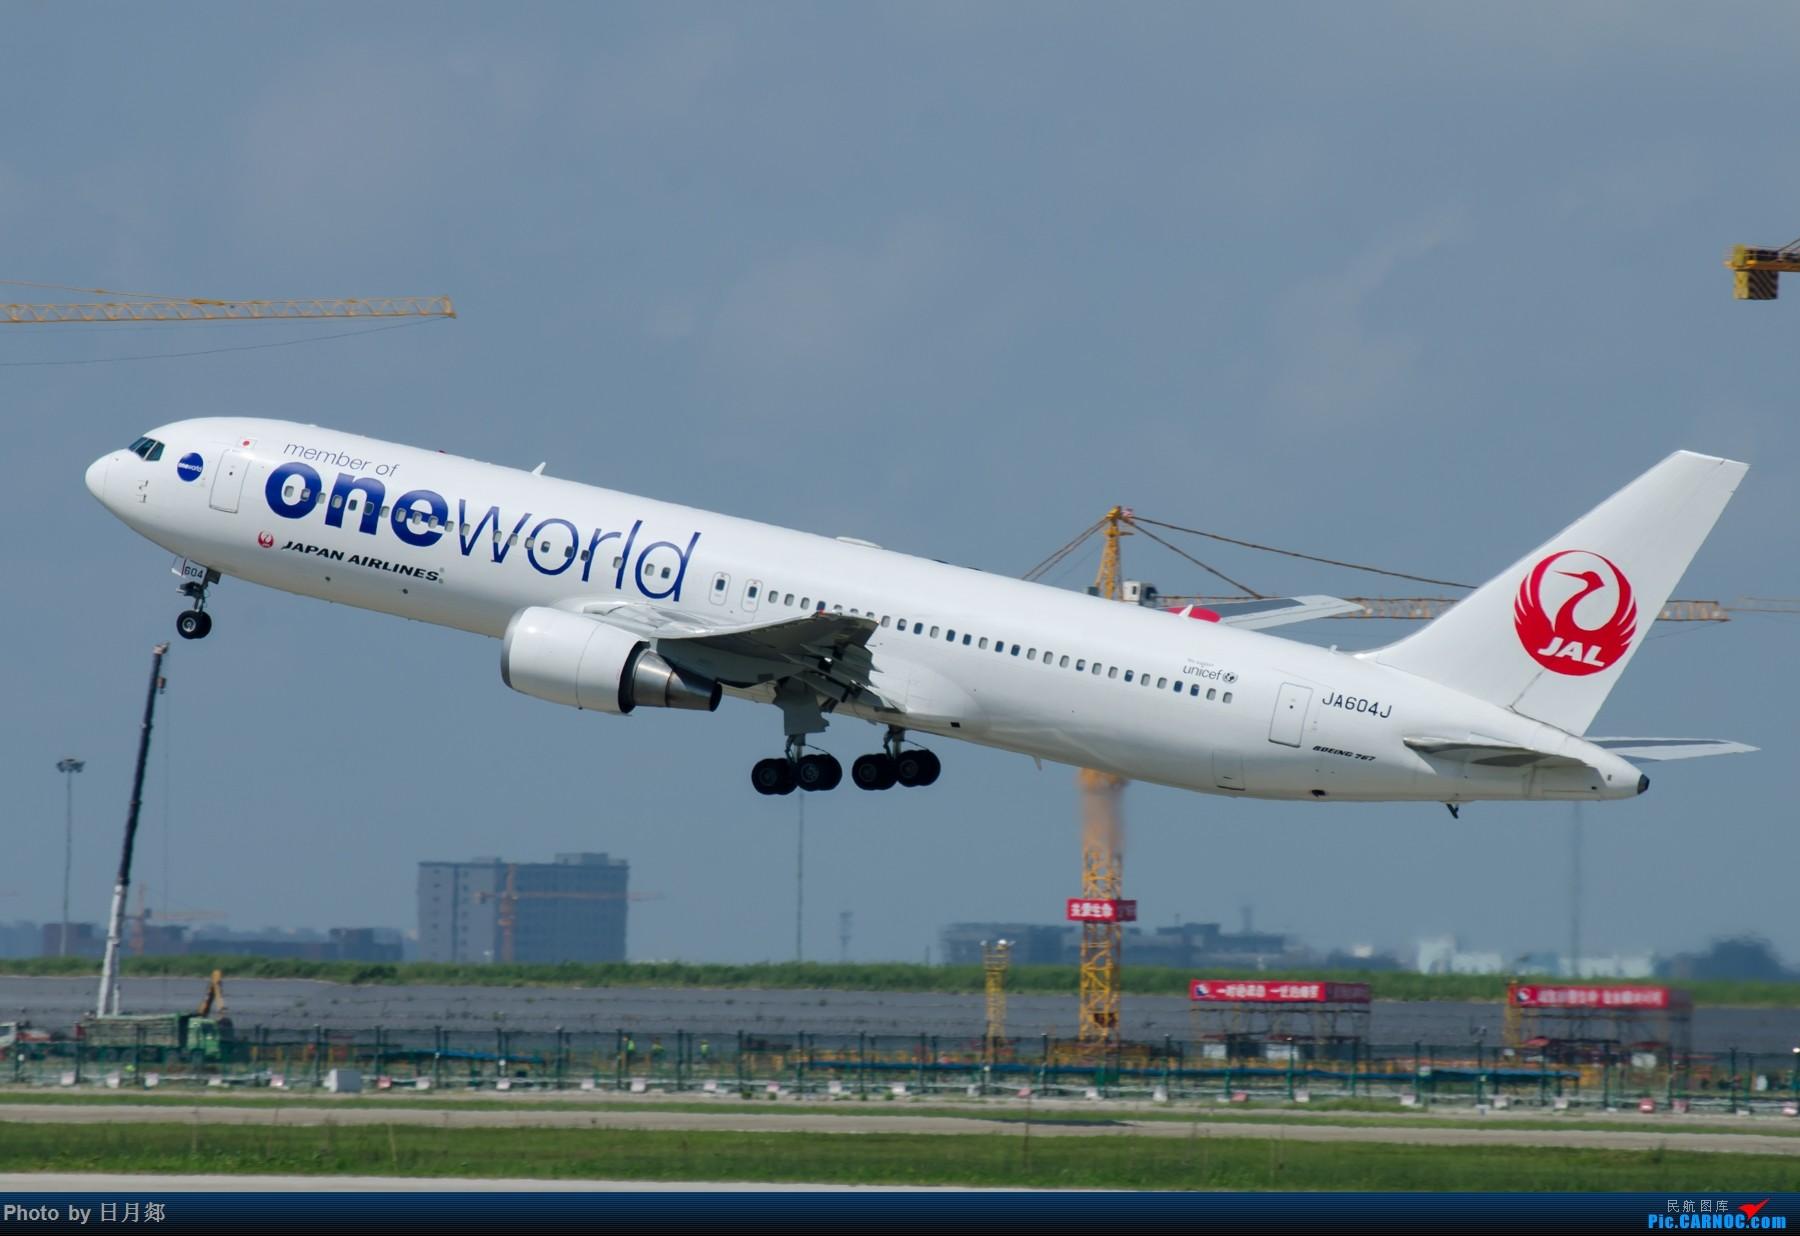 Re:[原创]一年起的最早的一次,PVG撒欢! BOEING 767 JA604J 中国上海浦东国际机场